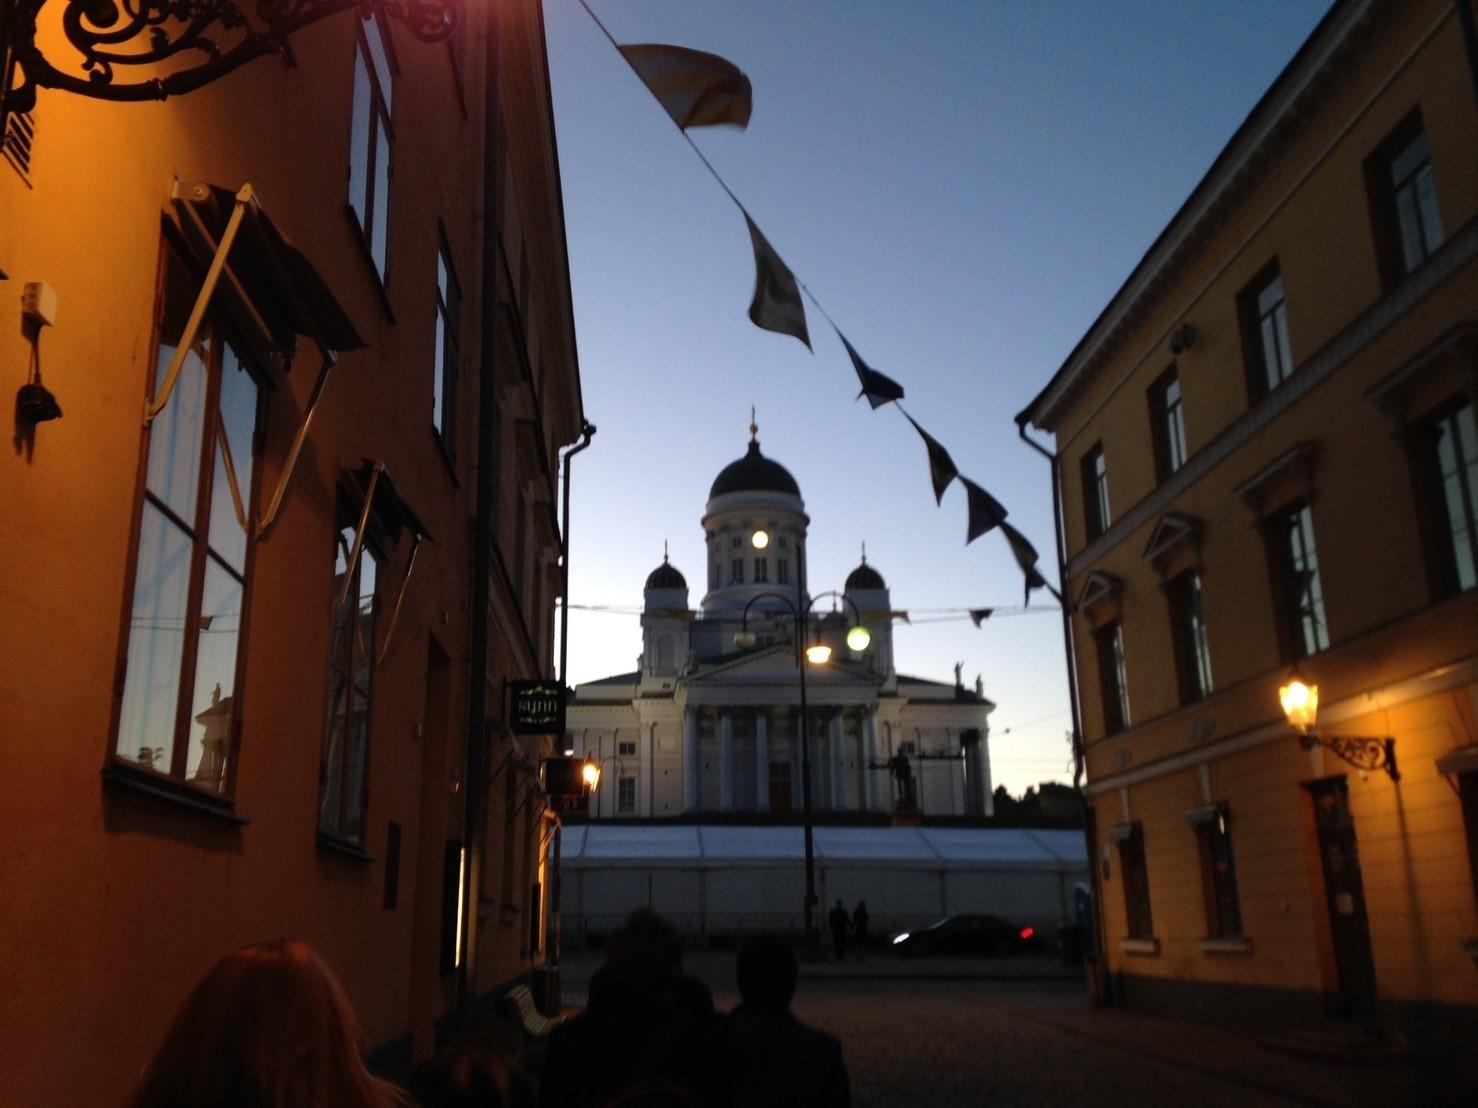 Helsinki Cathedral by Oscar H. L.